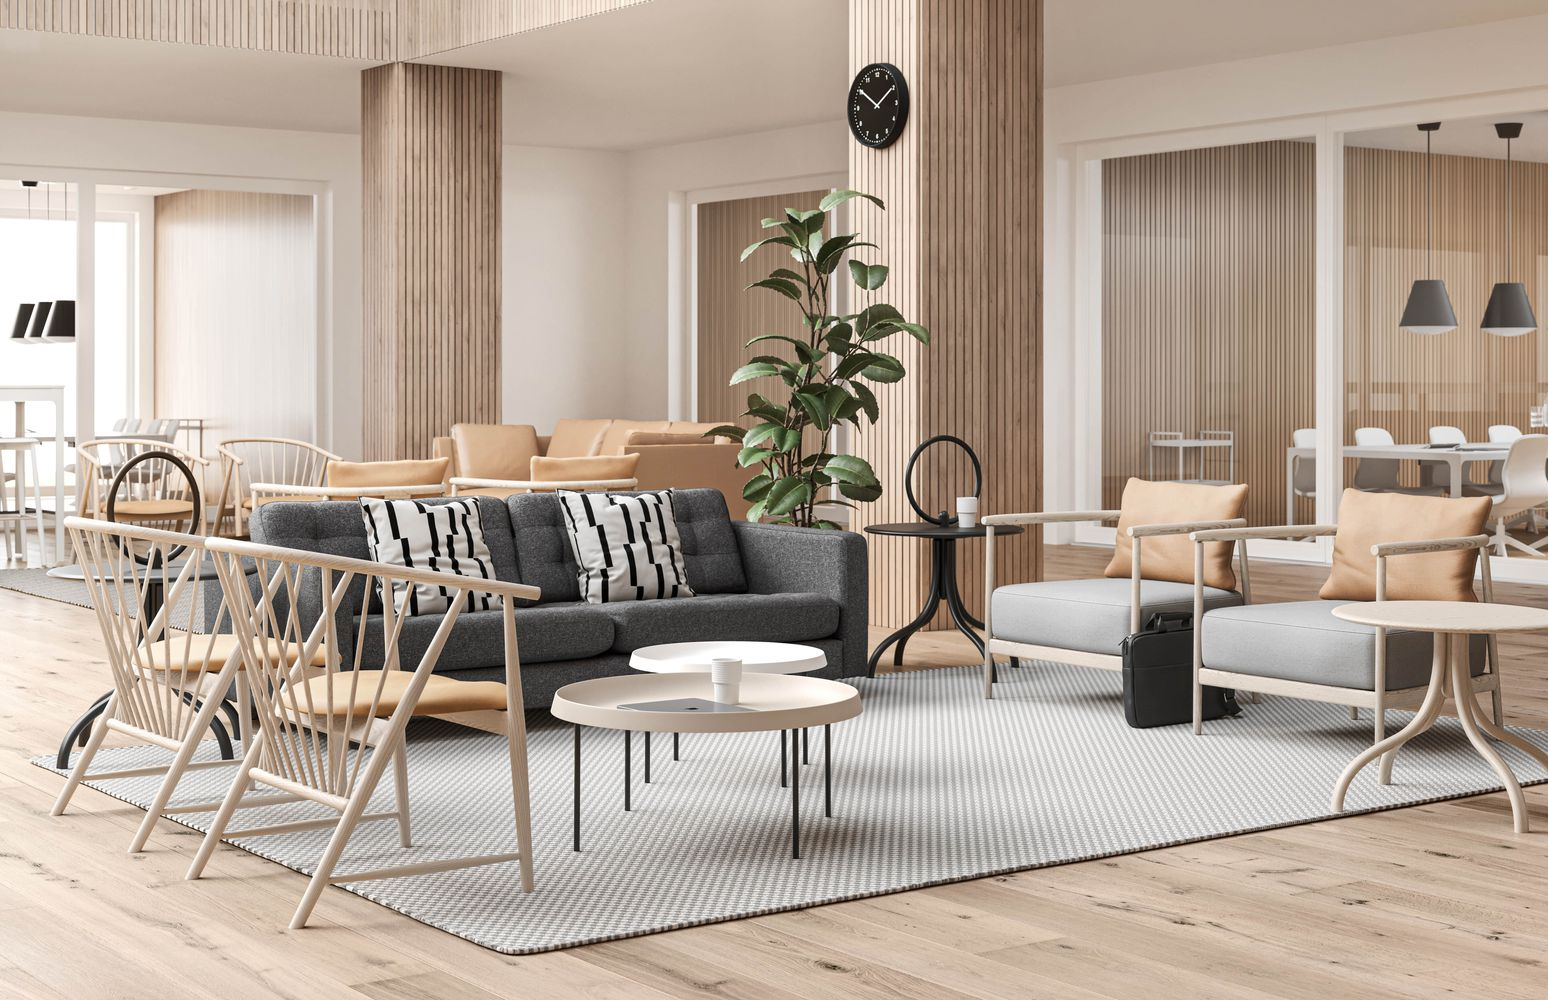 Open lounge area in nordic light.